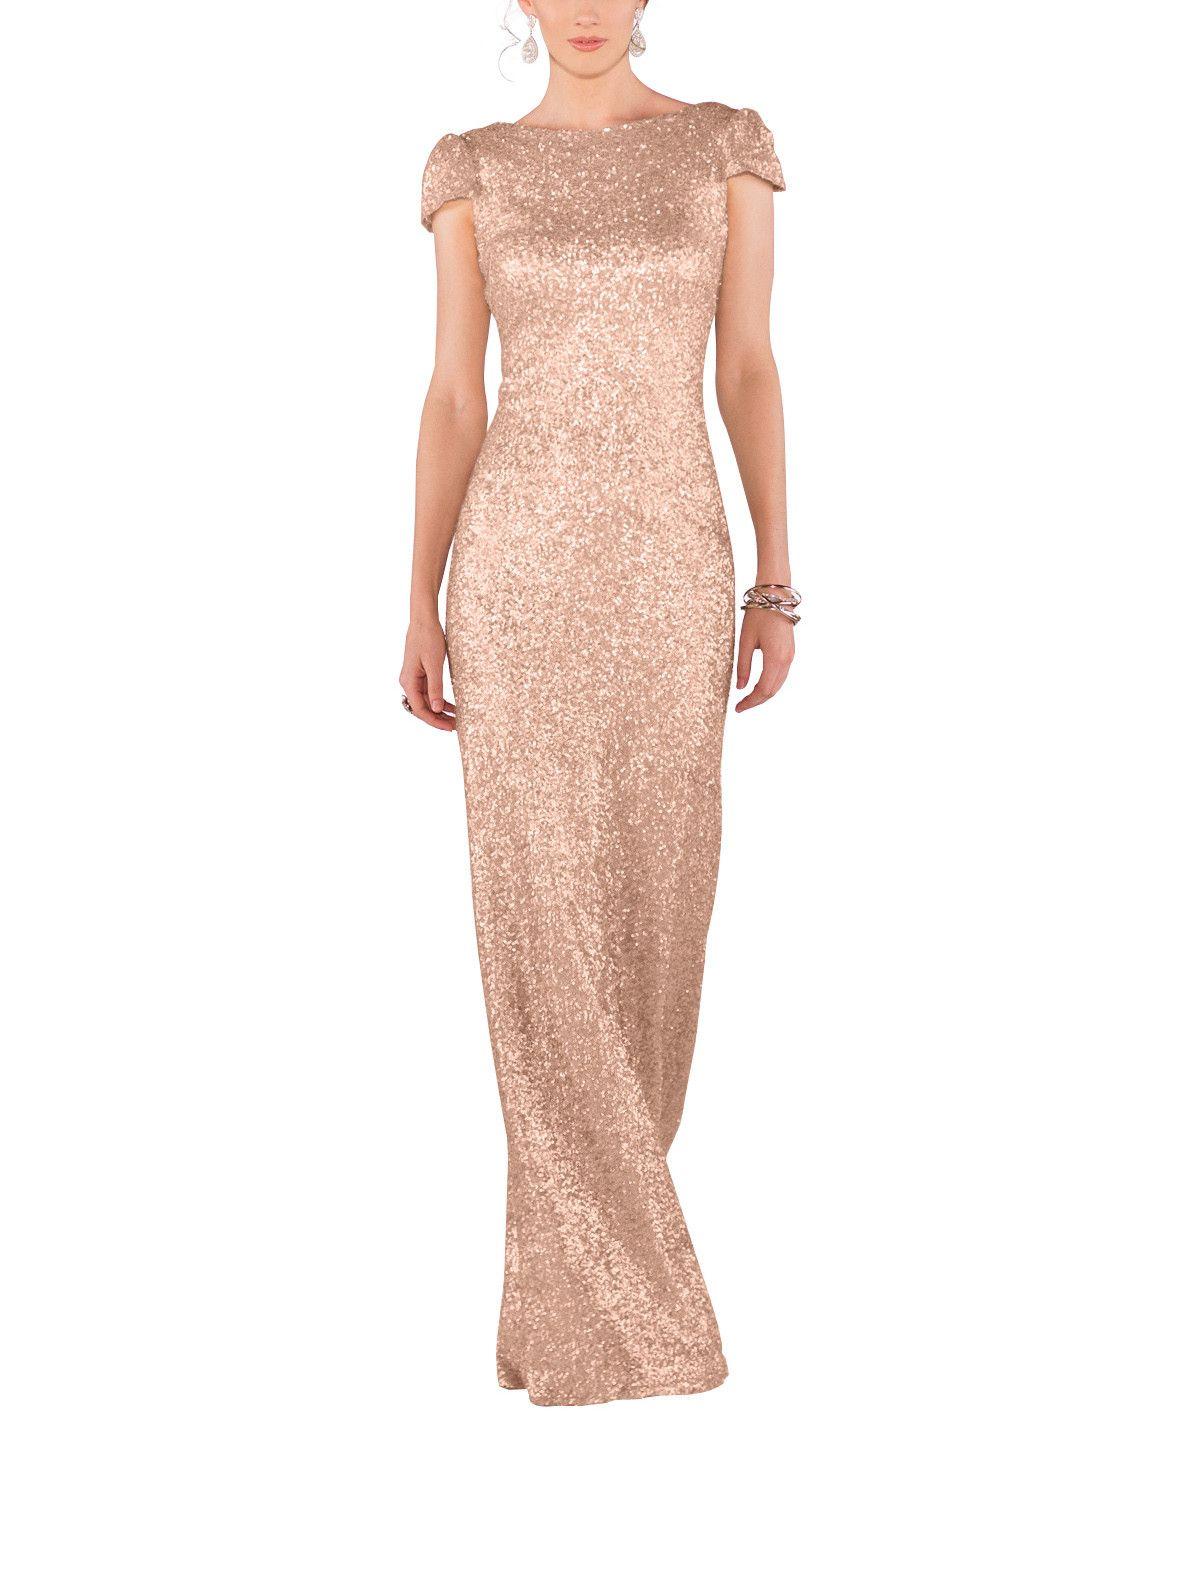 374f7863a69 DescriptionSorella Vita Modern Metallic Style 8718Full length bridesmaid  dressBoatneck Cowl back Cap sleeveMatte sequin